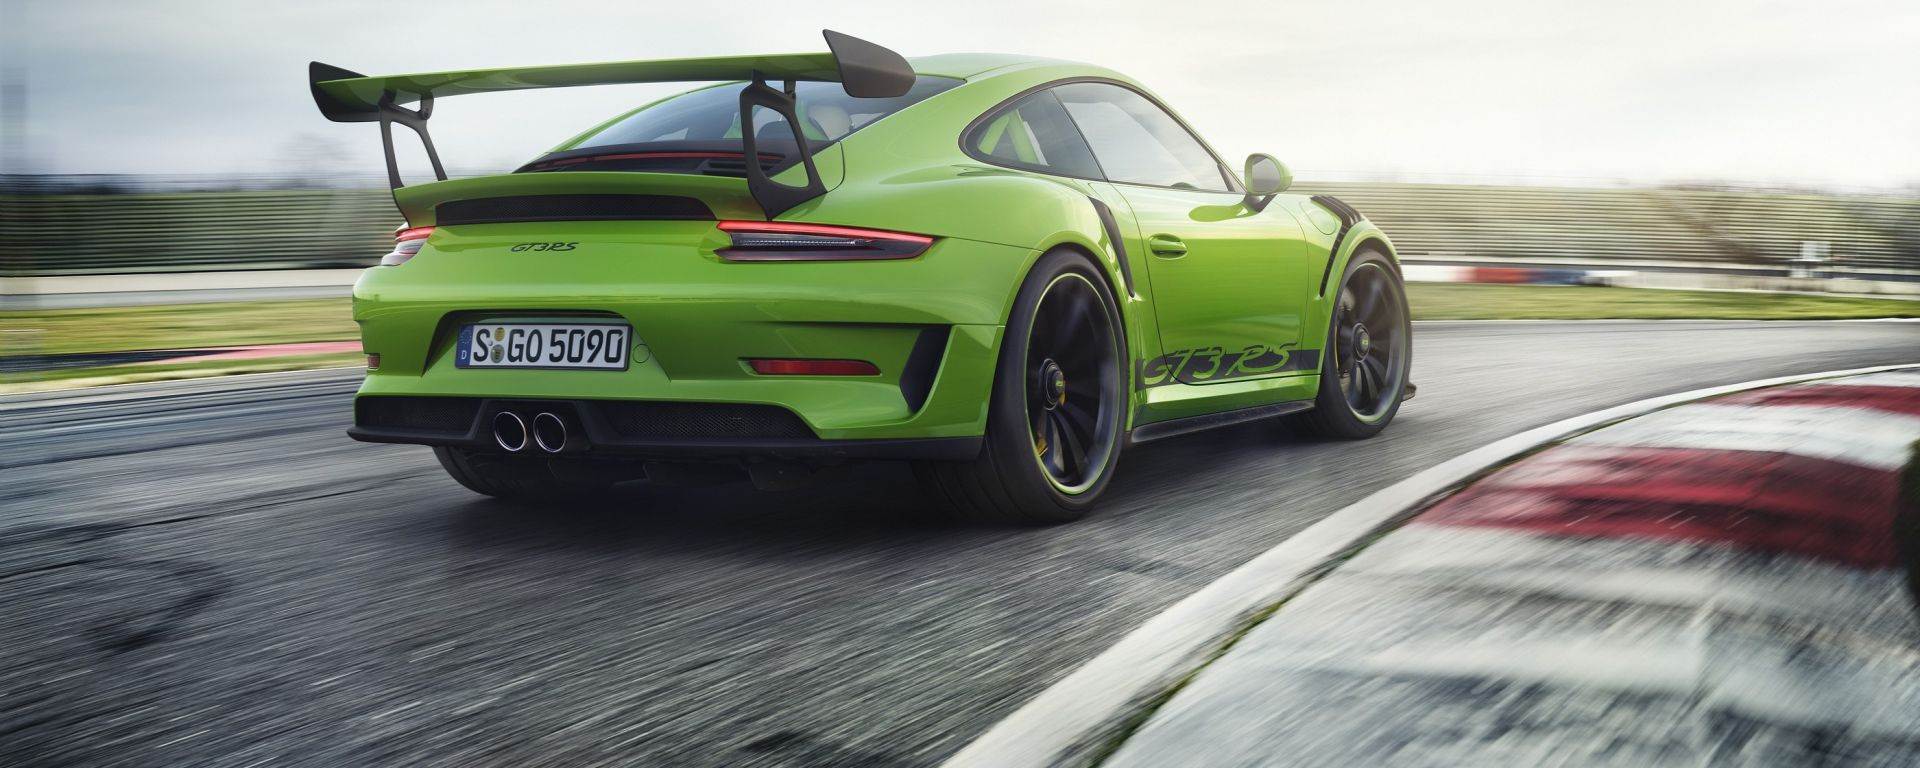 Porsche 911 GT3 RS 2018: Gira al Nurburgring in 6:56